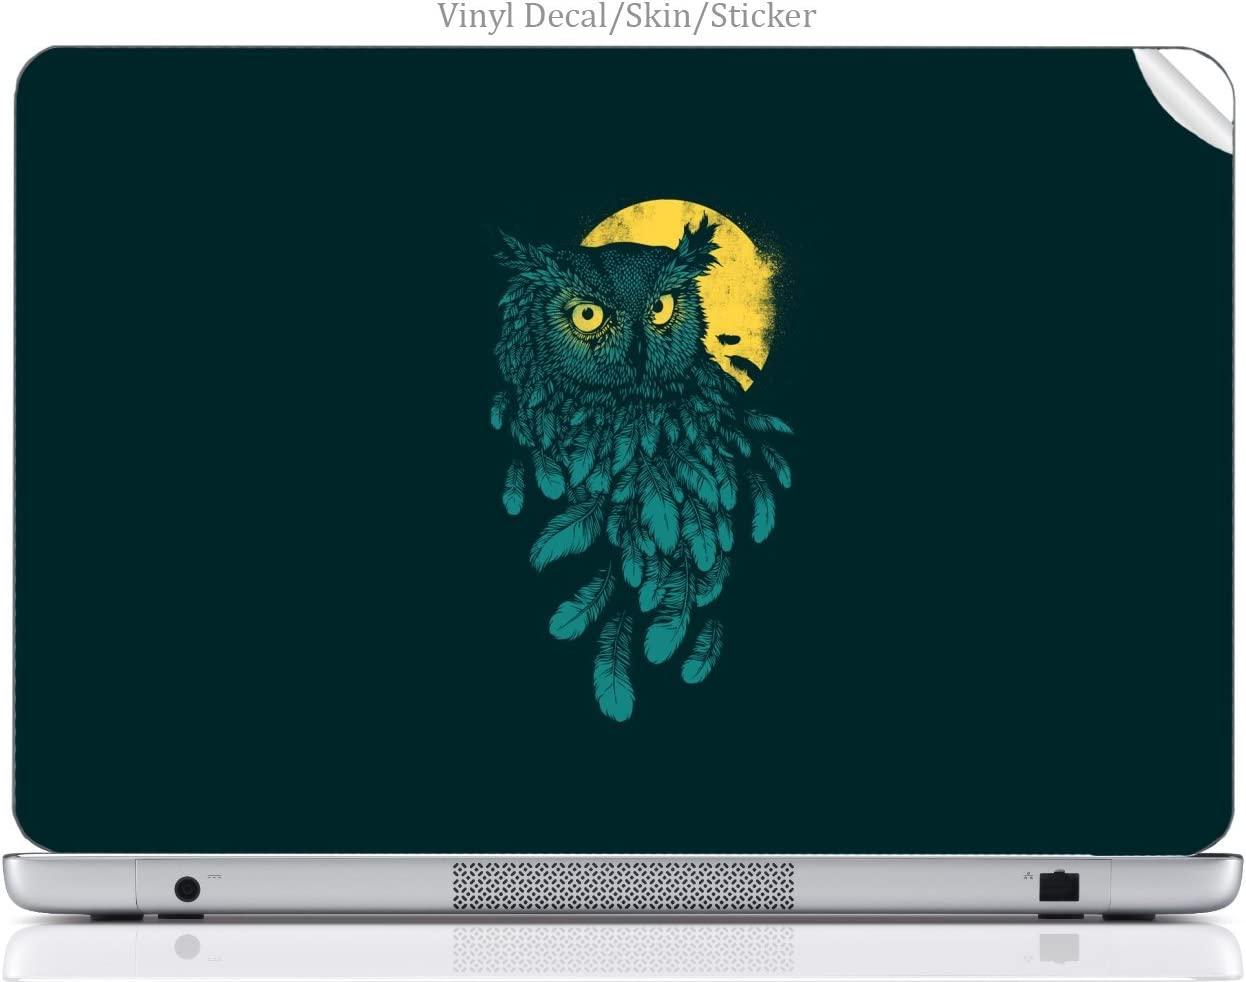 Laptop VINYL DECAL Sticker Skin Print Minimalist Owl & Moon Art fits MacBook Pro 15.4-inch